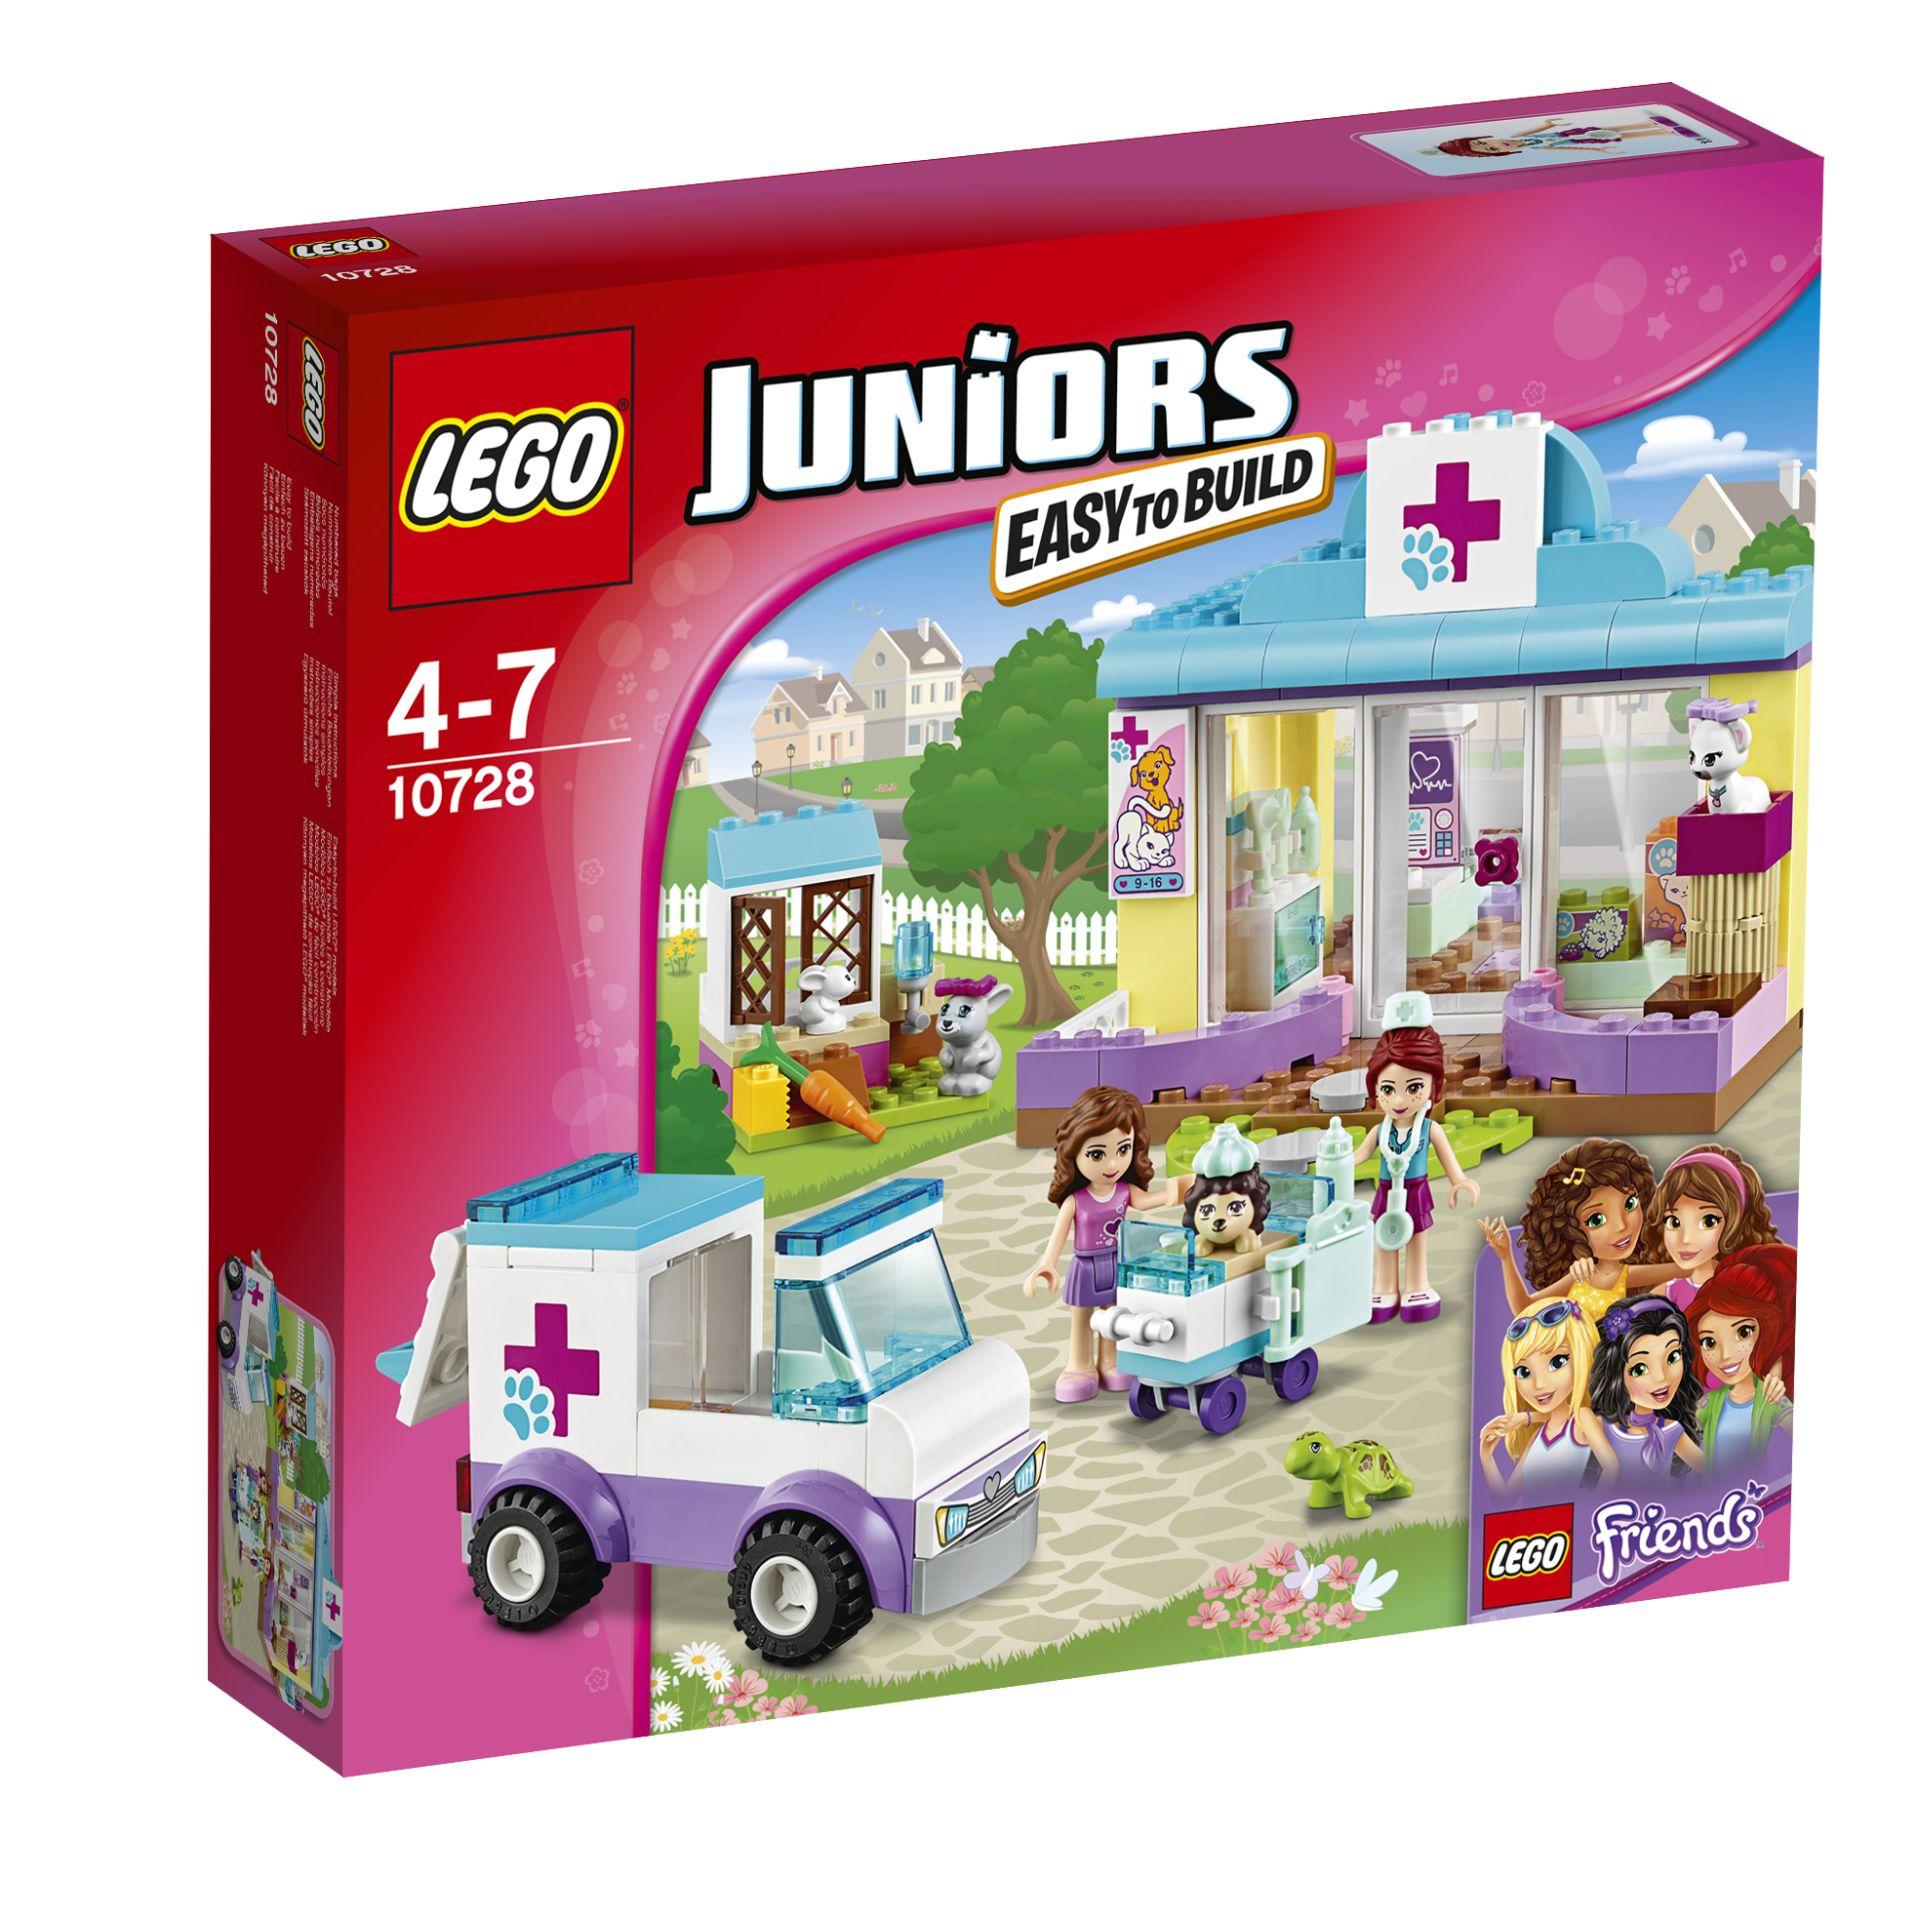 LEGO Juniors Mia's animal hospital 2016 - Buy at kidsroom ...